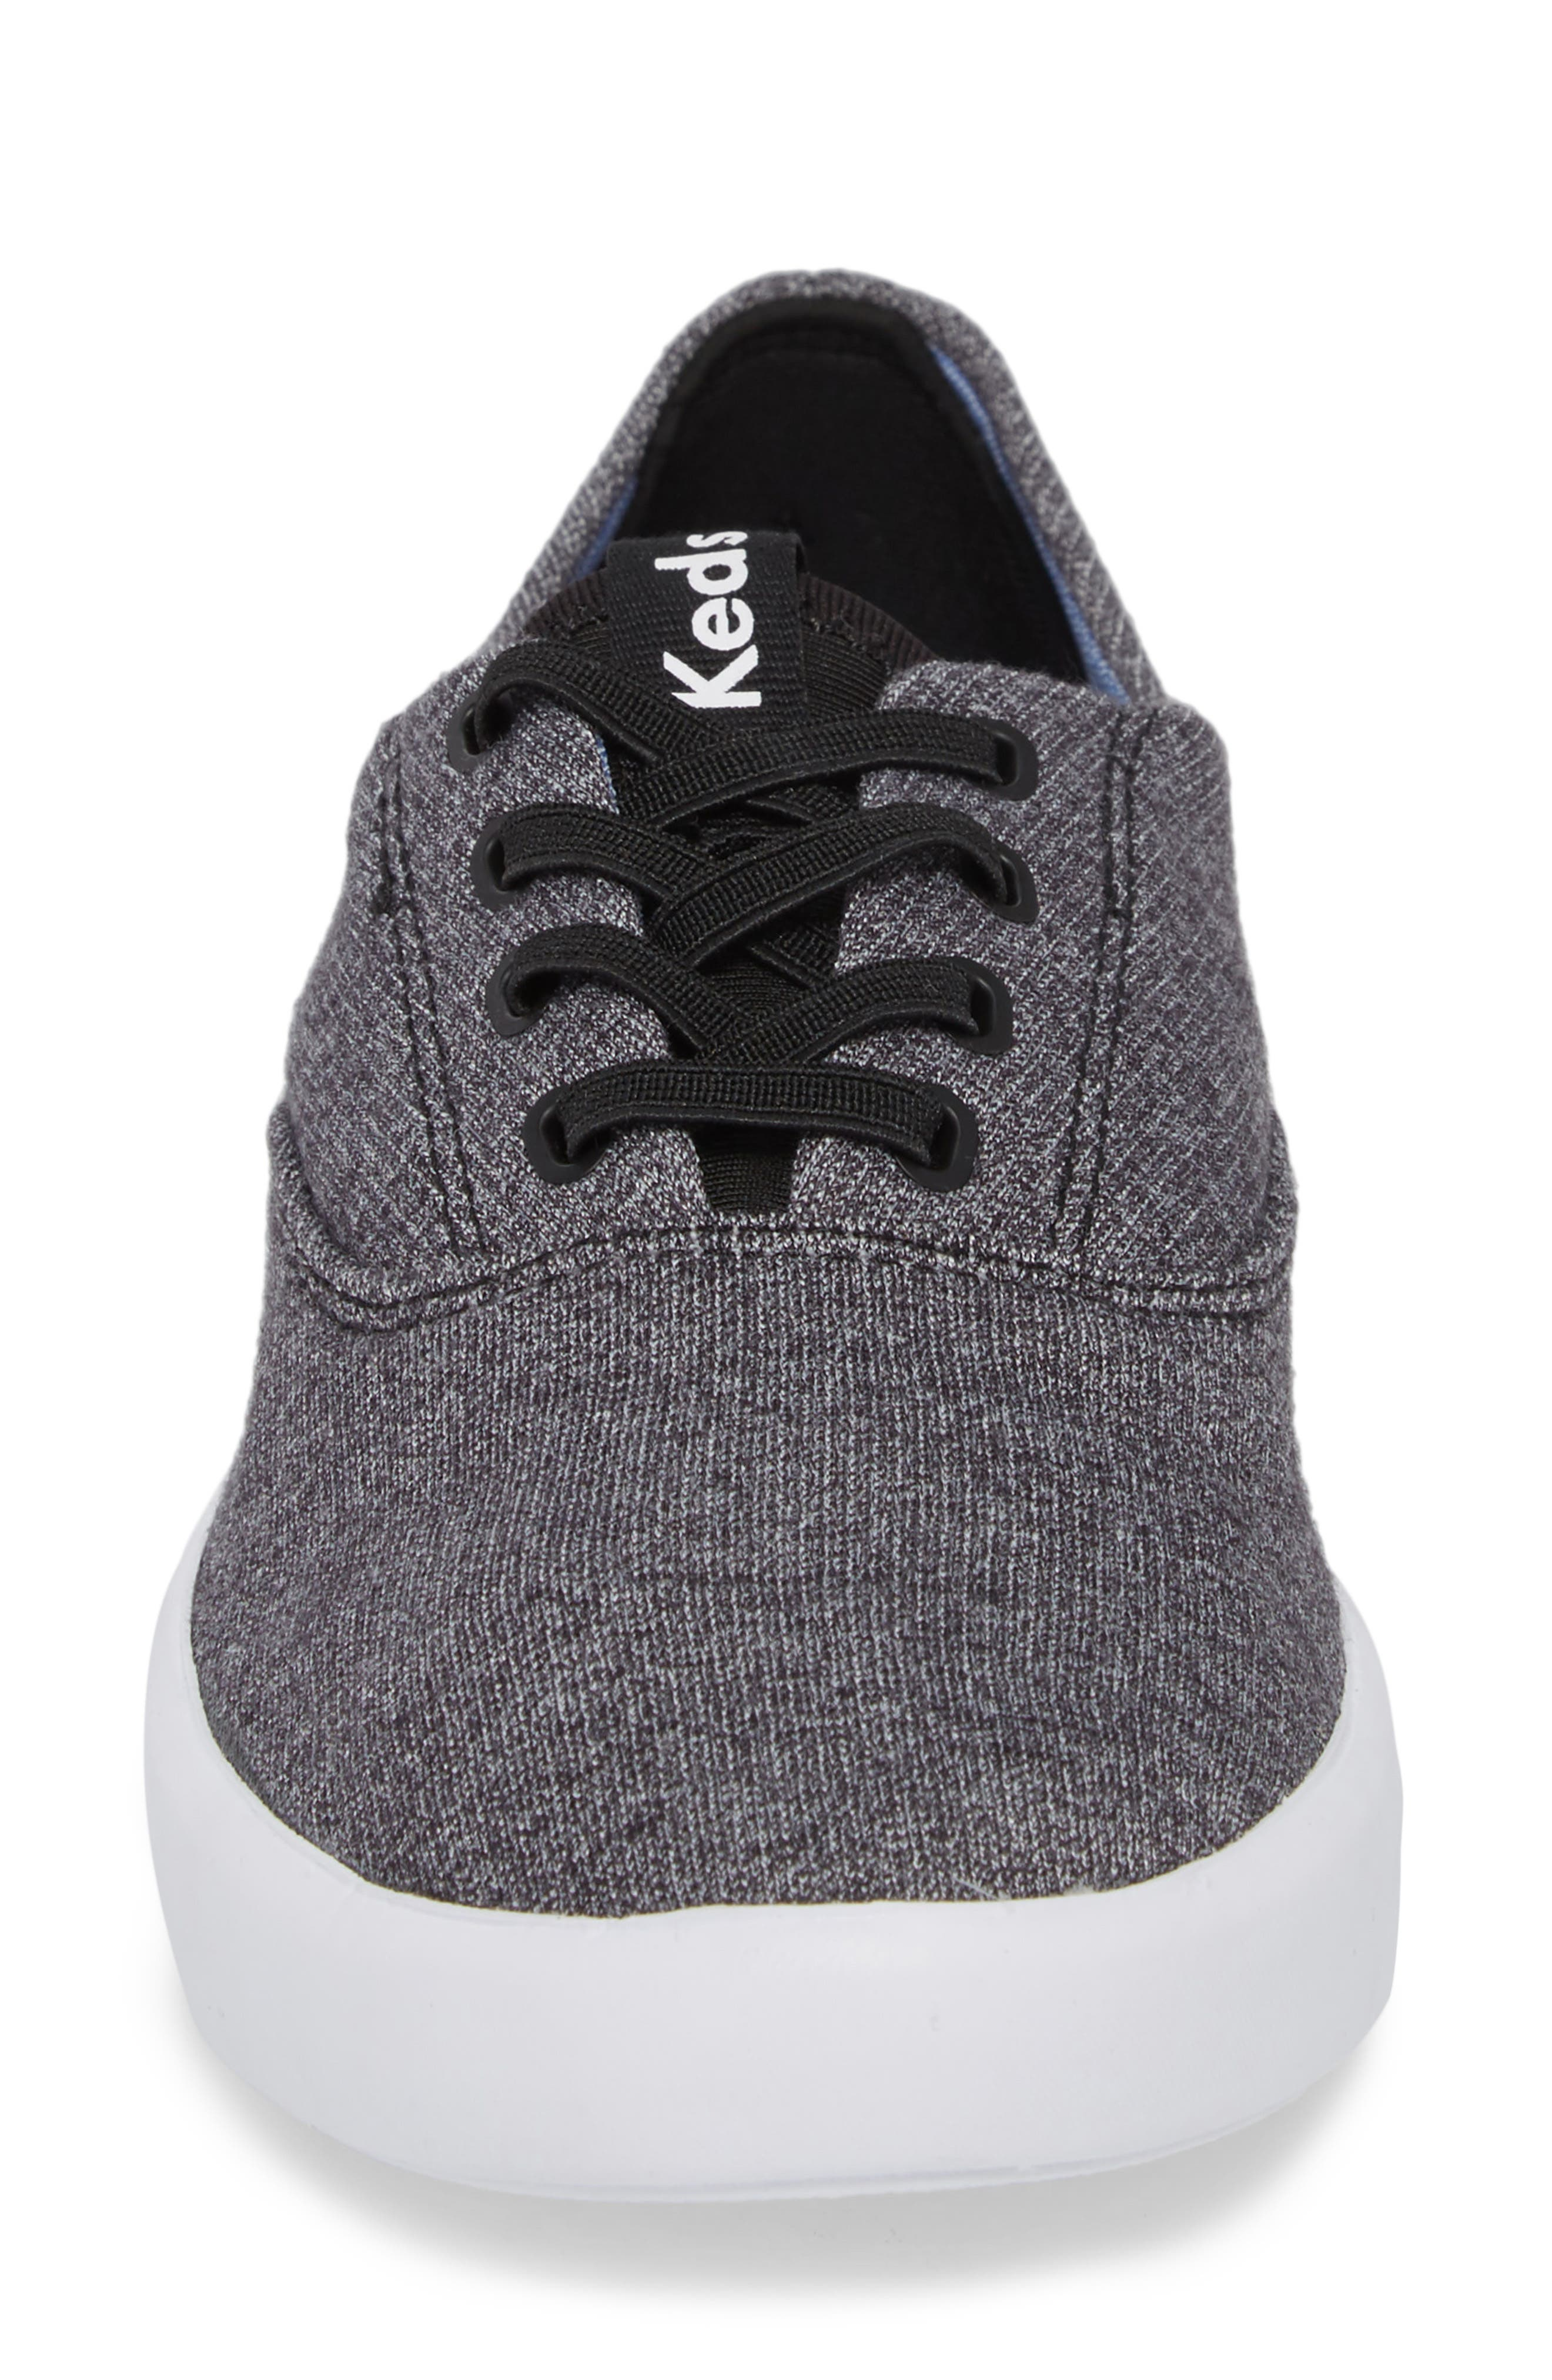 Studio Leap Sneaker,                             Alternate thumbnail 4, color,                             Charcoal